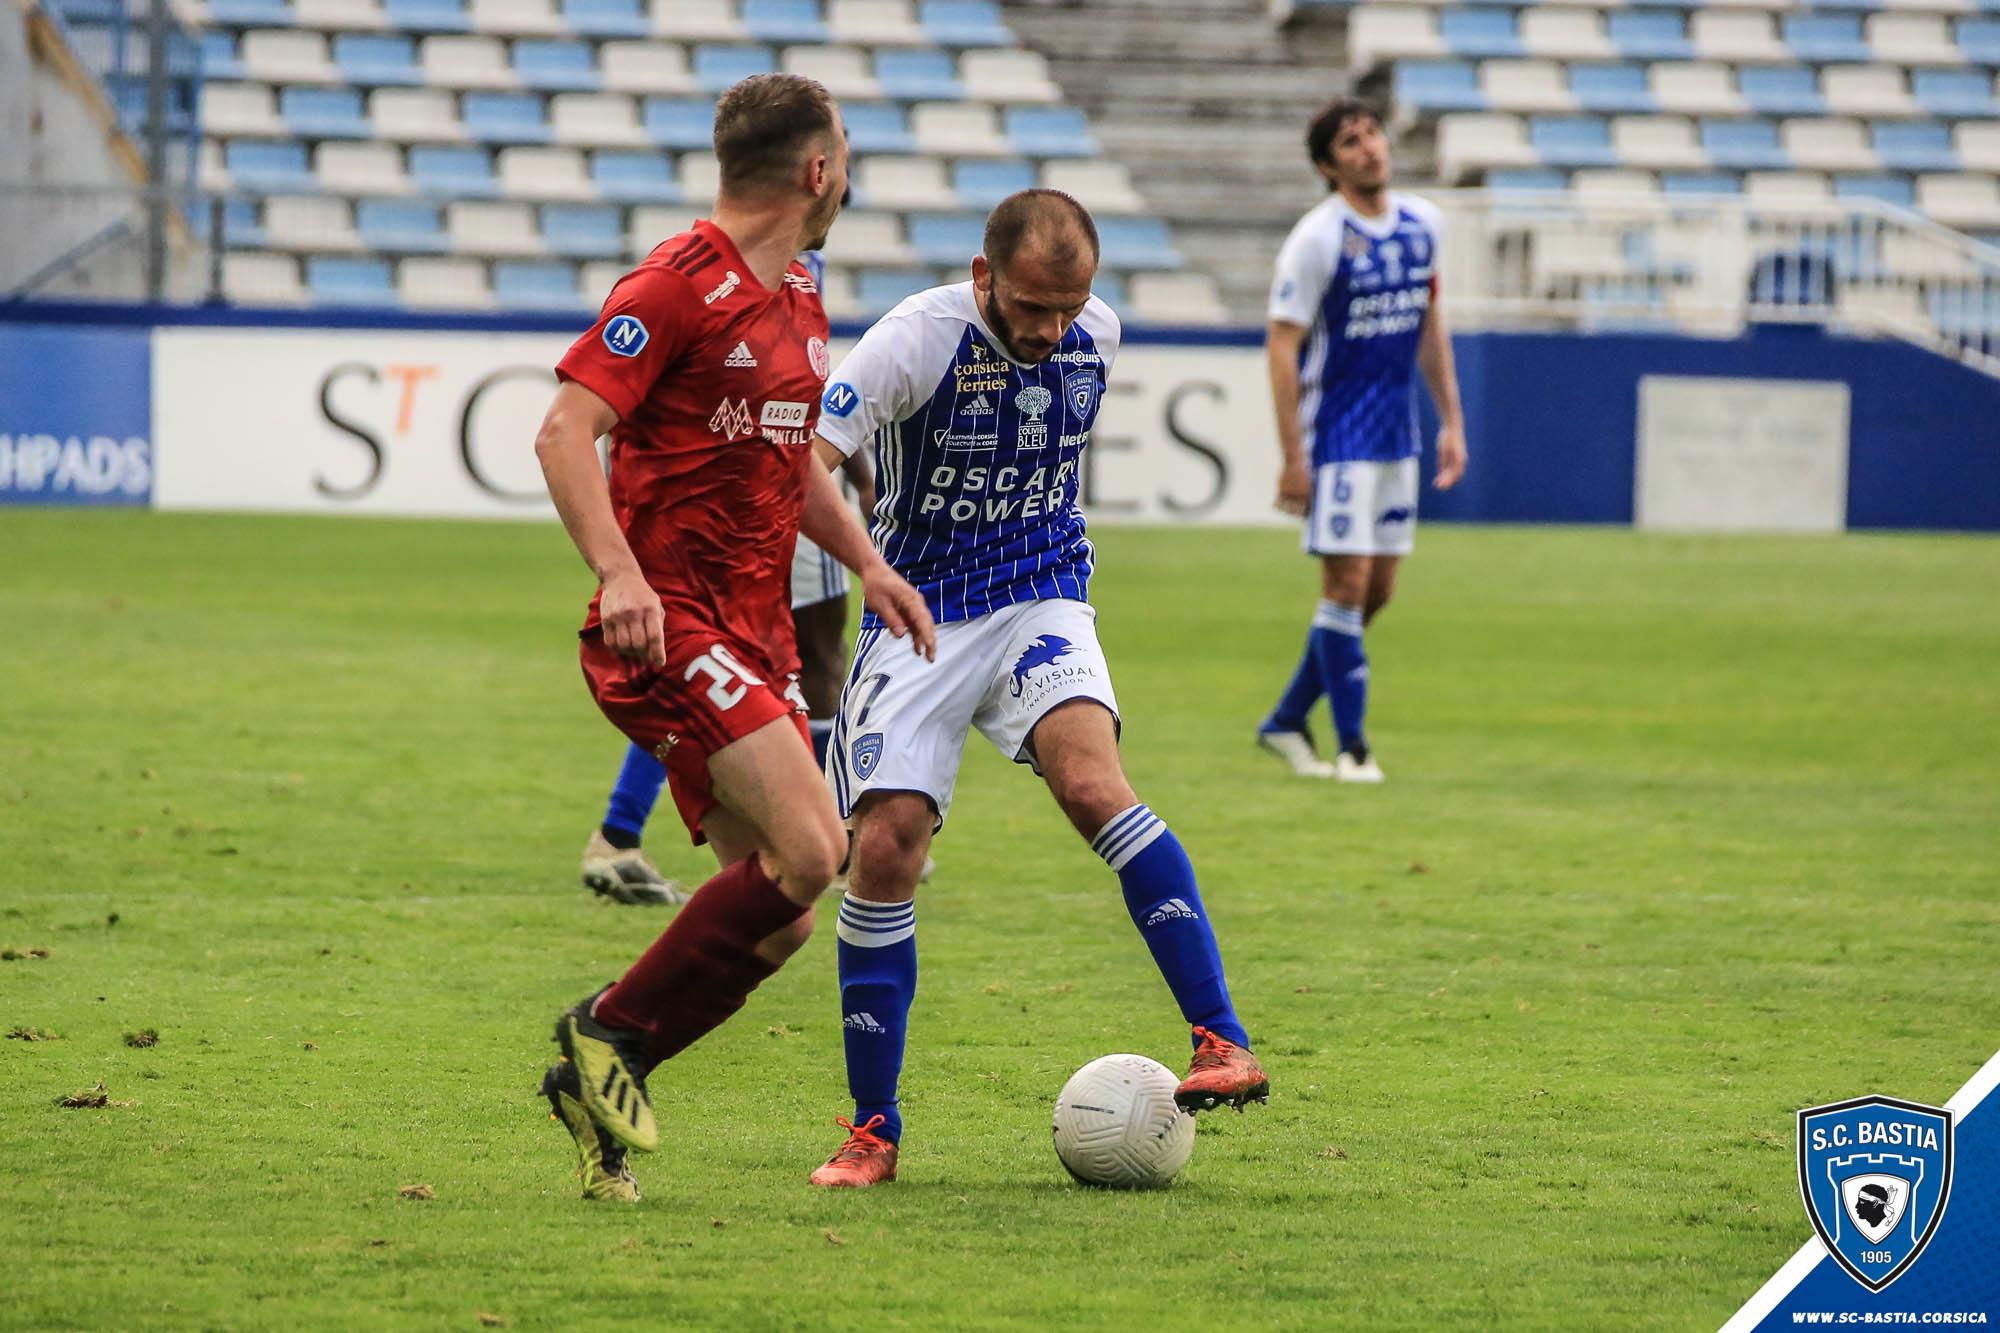 SCB 0-1 FCA (30/04/2021)